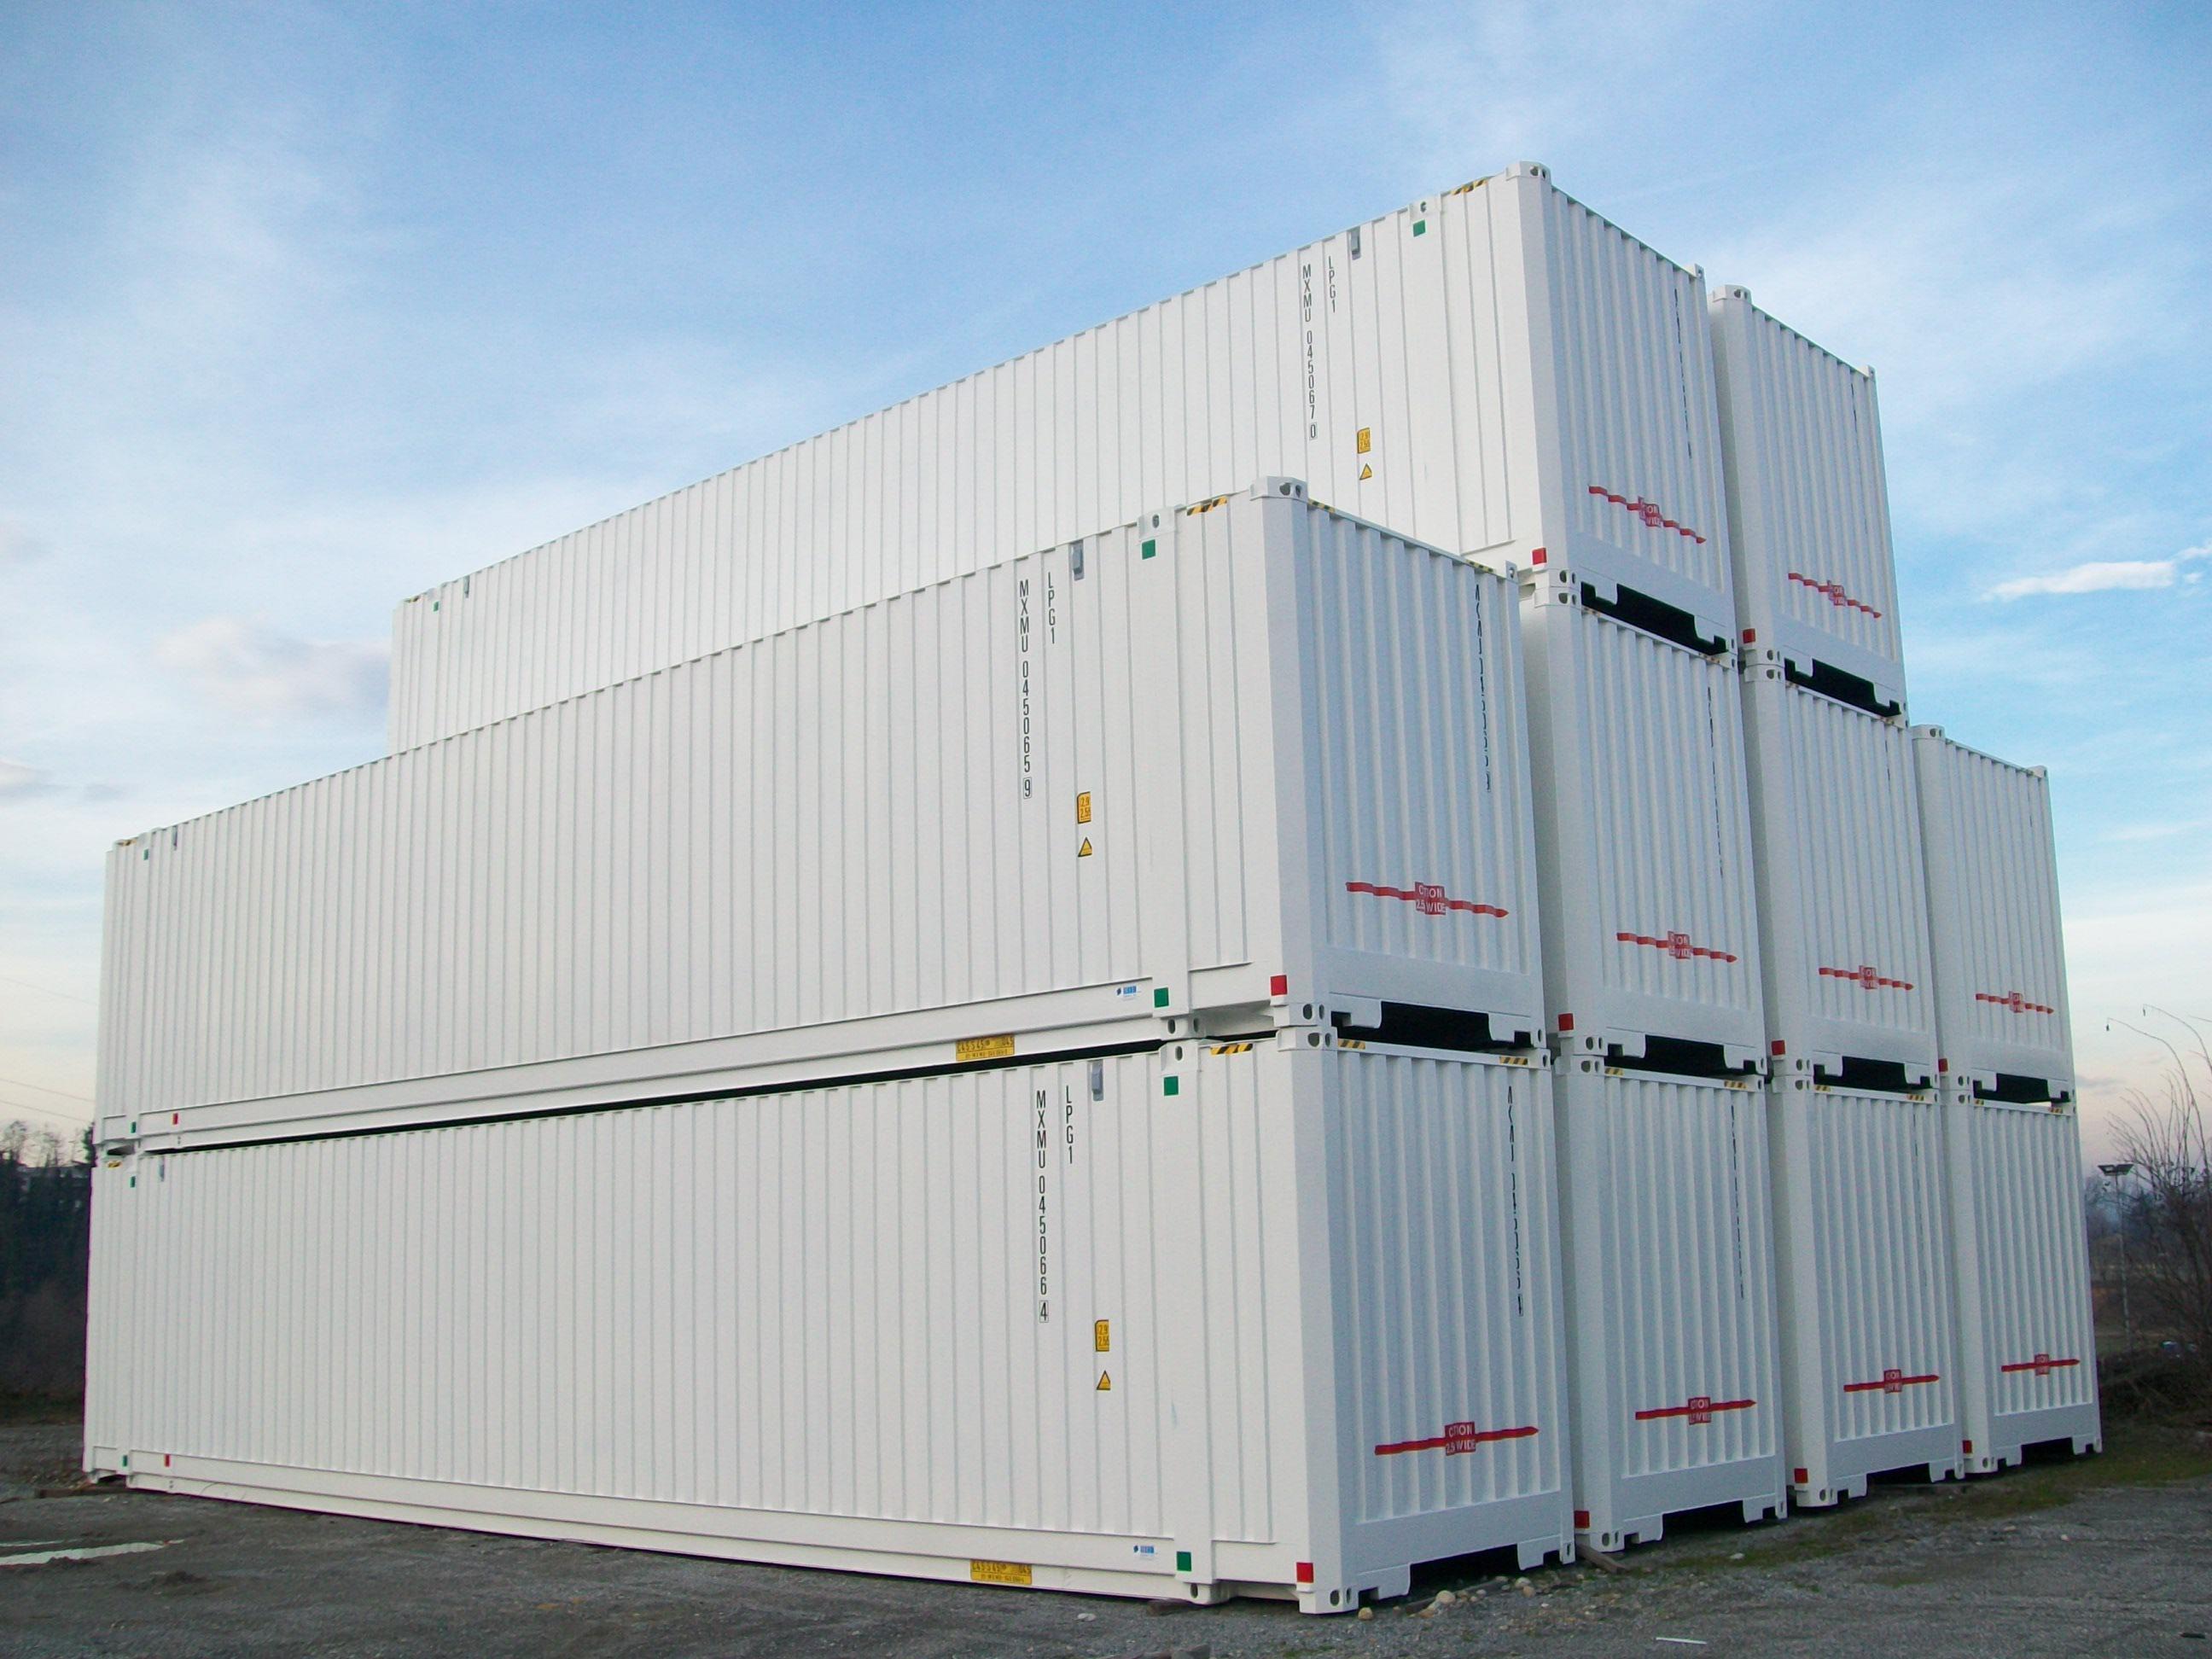 caisse mobile 45 ft location MODALIS palettisable